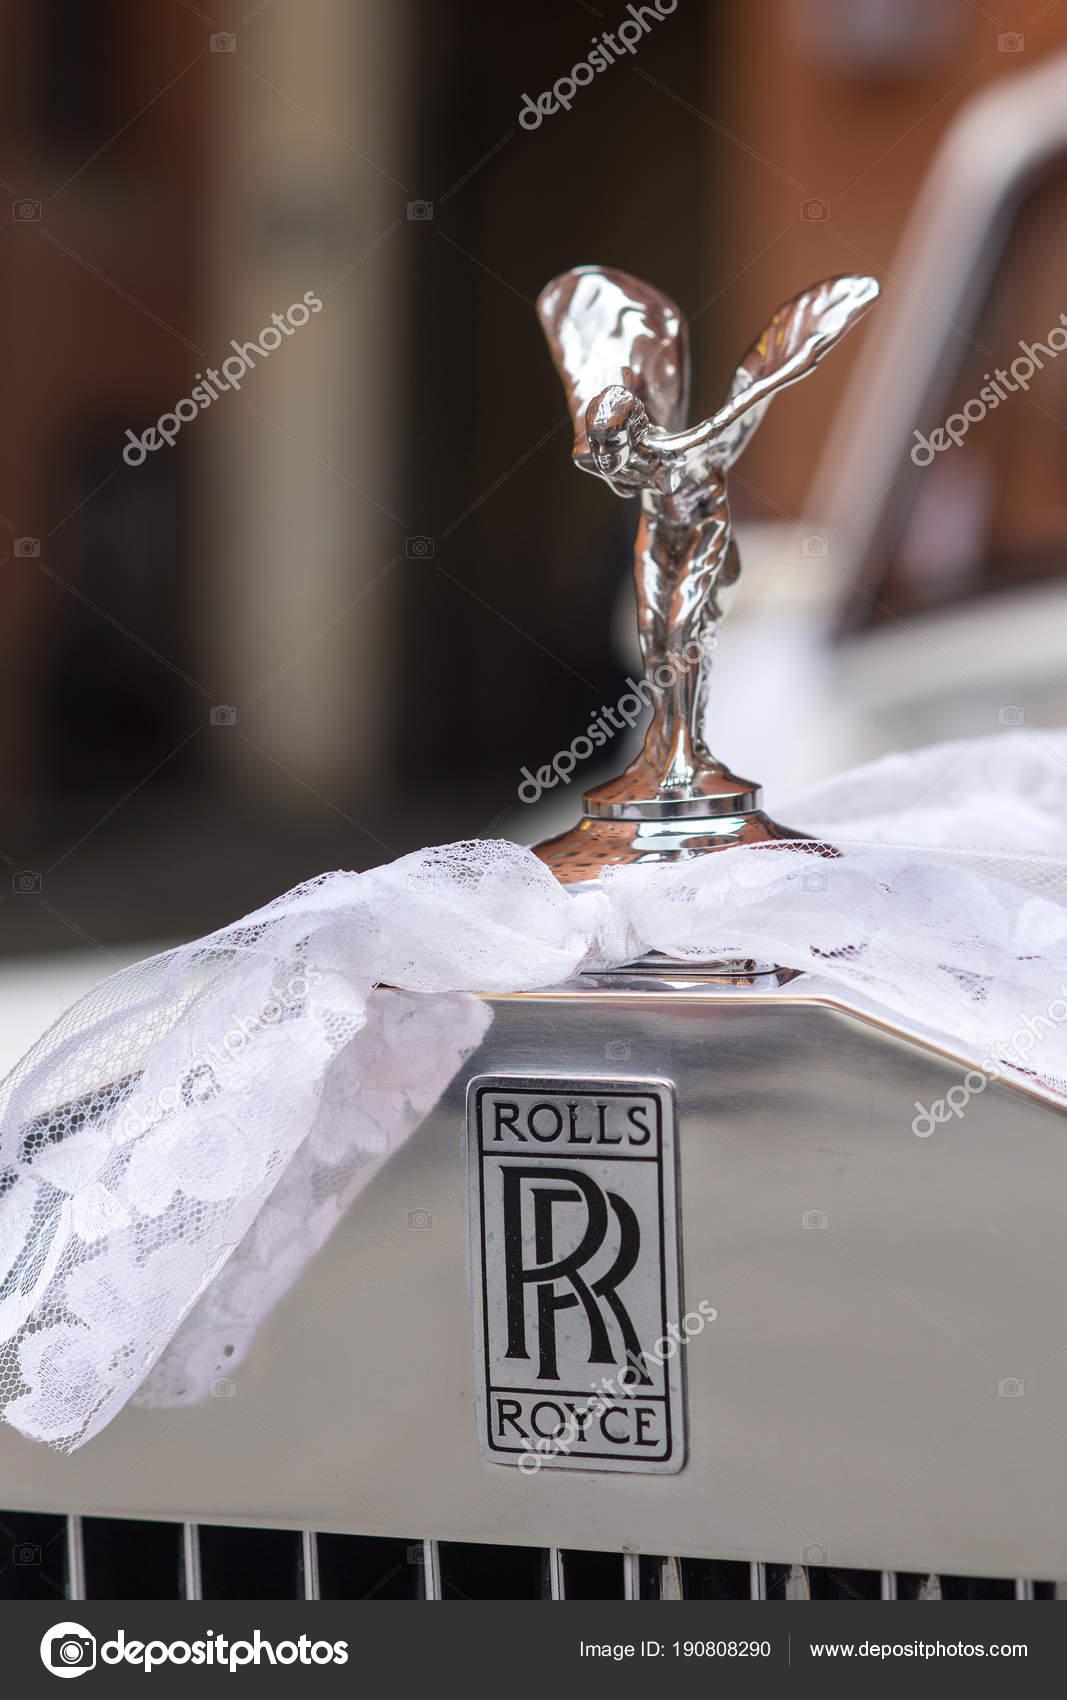 Italia Rolls Estasi Royce Ottobre Spirito 2016 Bologna Phantom stQdrhC